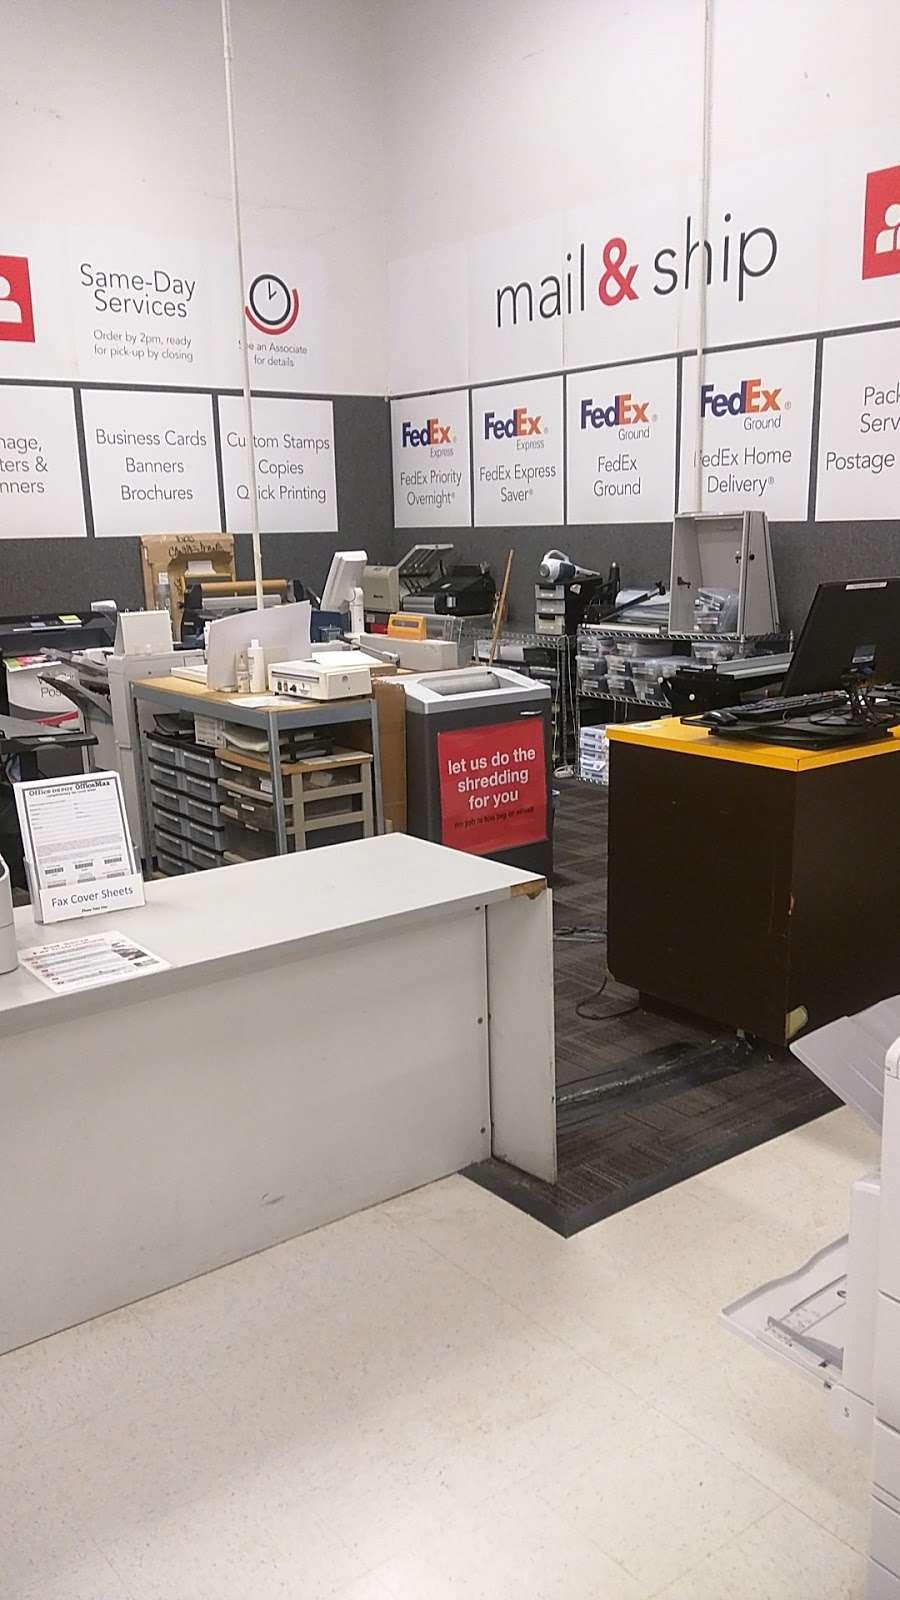 Office Depot - furniture store  | Photo 10 of 10 | Address: 12275 Price Club Plaza #C, Fairfax, VA 22030, USA | Phone: (703) 830-7773